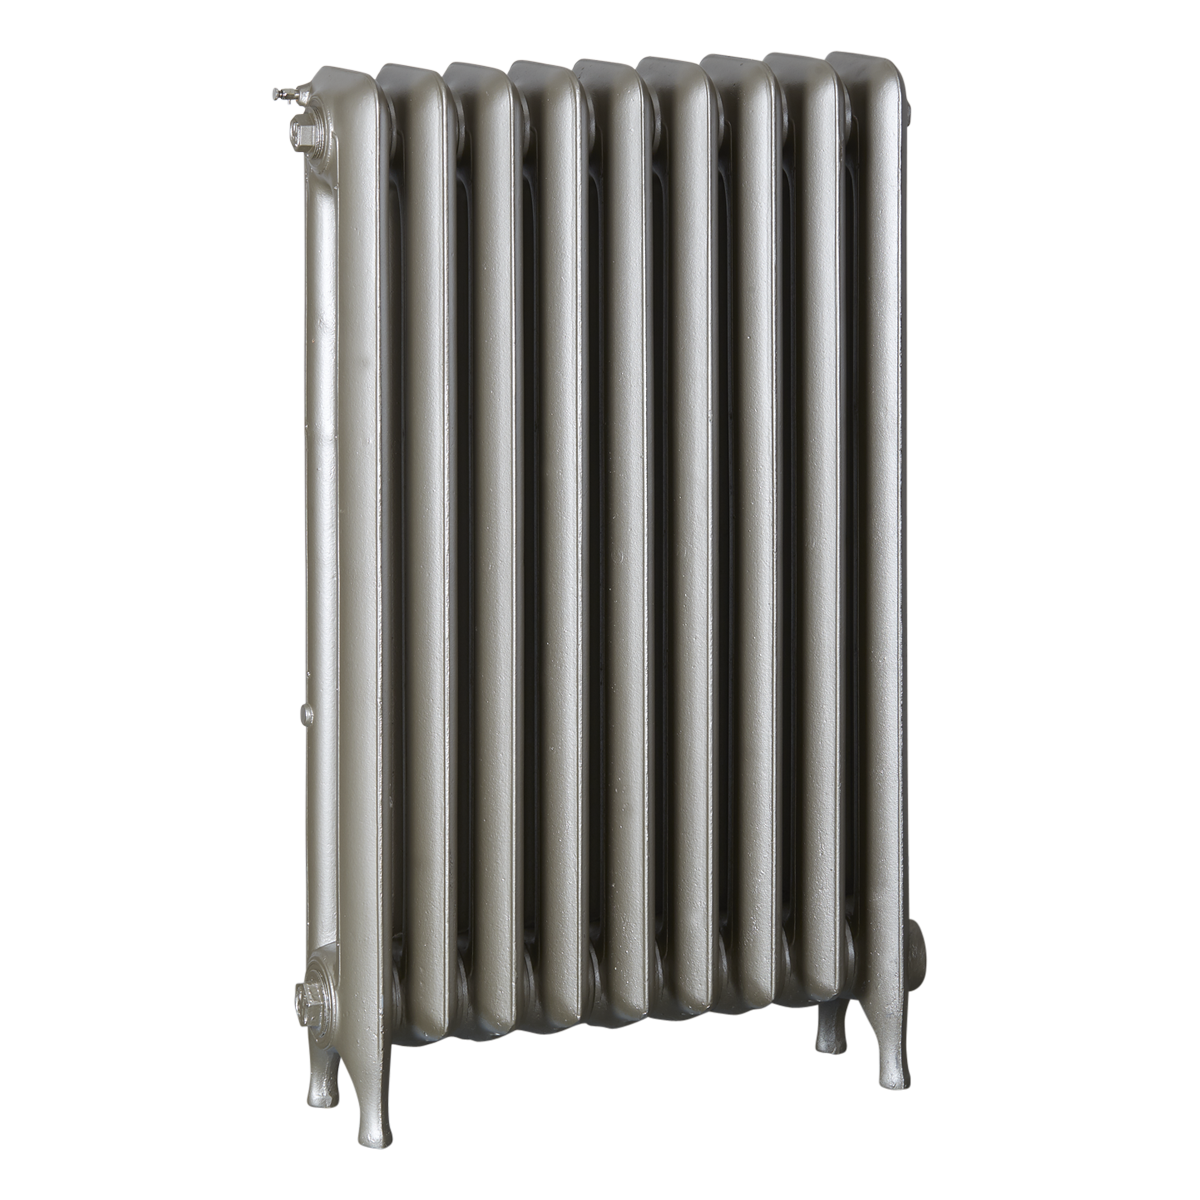 Ironworks Radiators Inc. refurbished cast iron radiator Eastbourne in Nickel Metallic